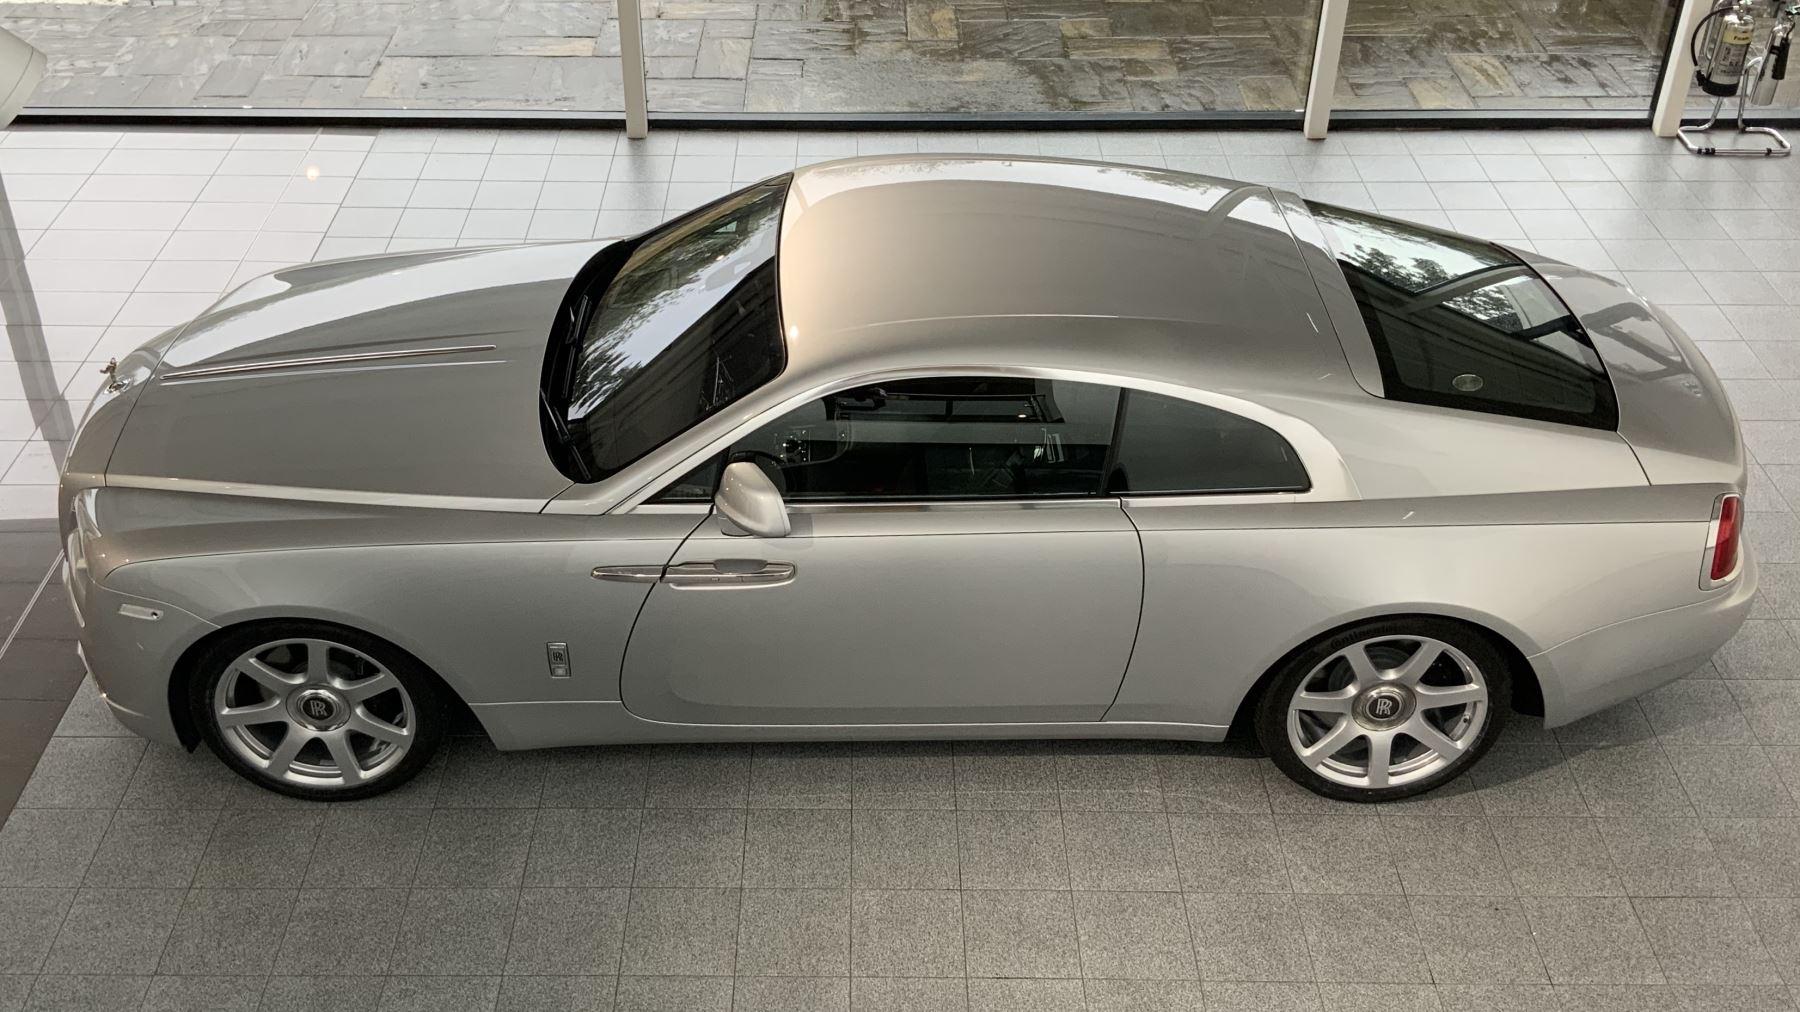 Rolls-Royce Wraith V12 image 9